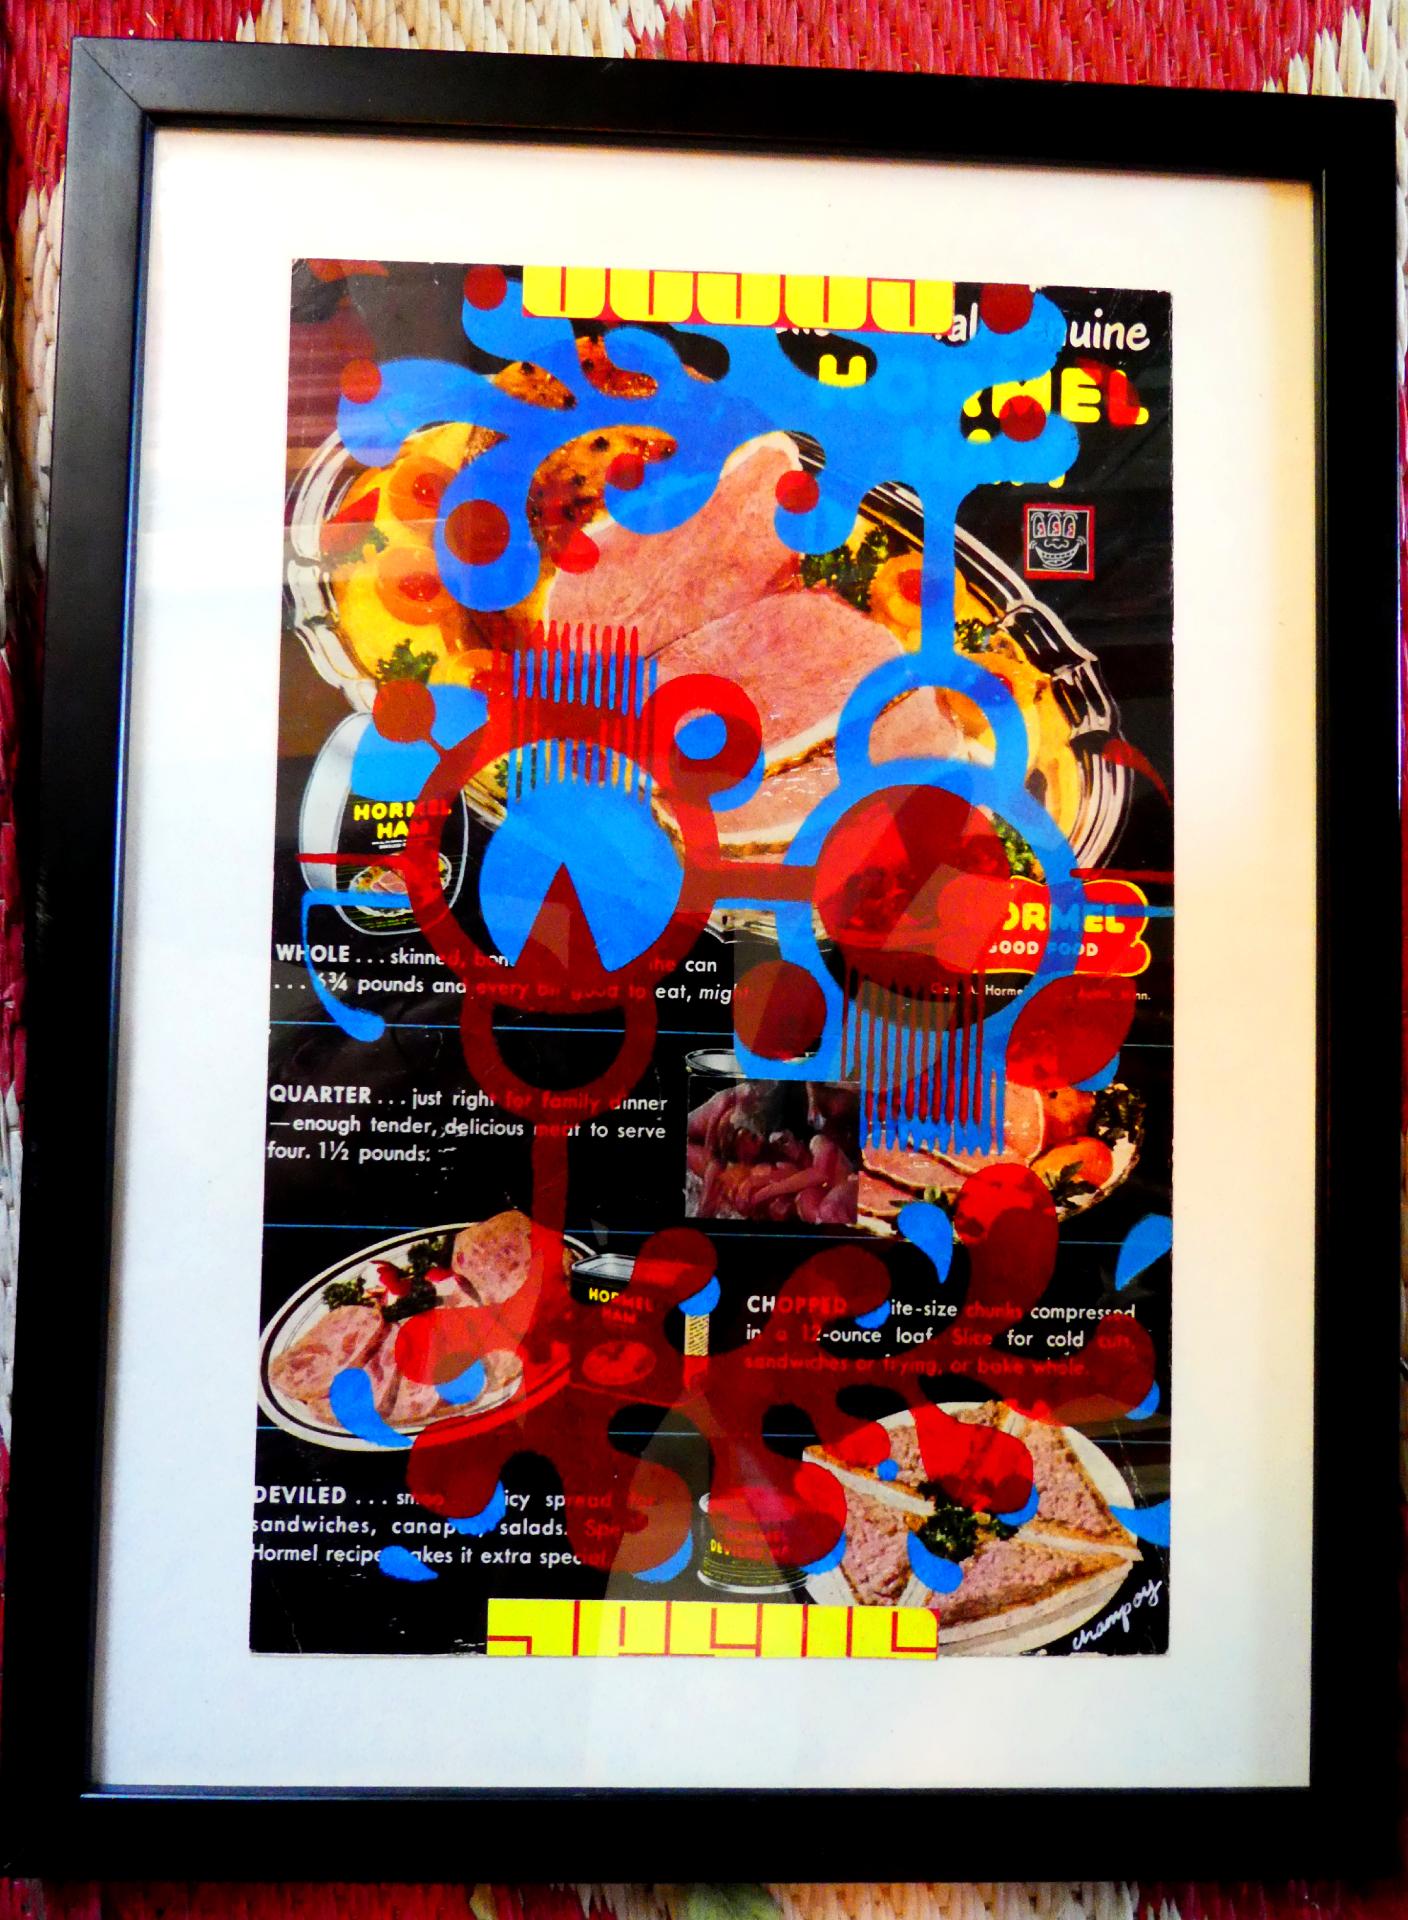 #eroticart #filipinoamericanartist #collage #spam #sexorgy #meat #printmaking #filiamart #losangelesartist #champoy #champchampchampoy